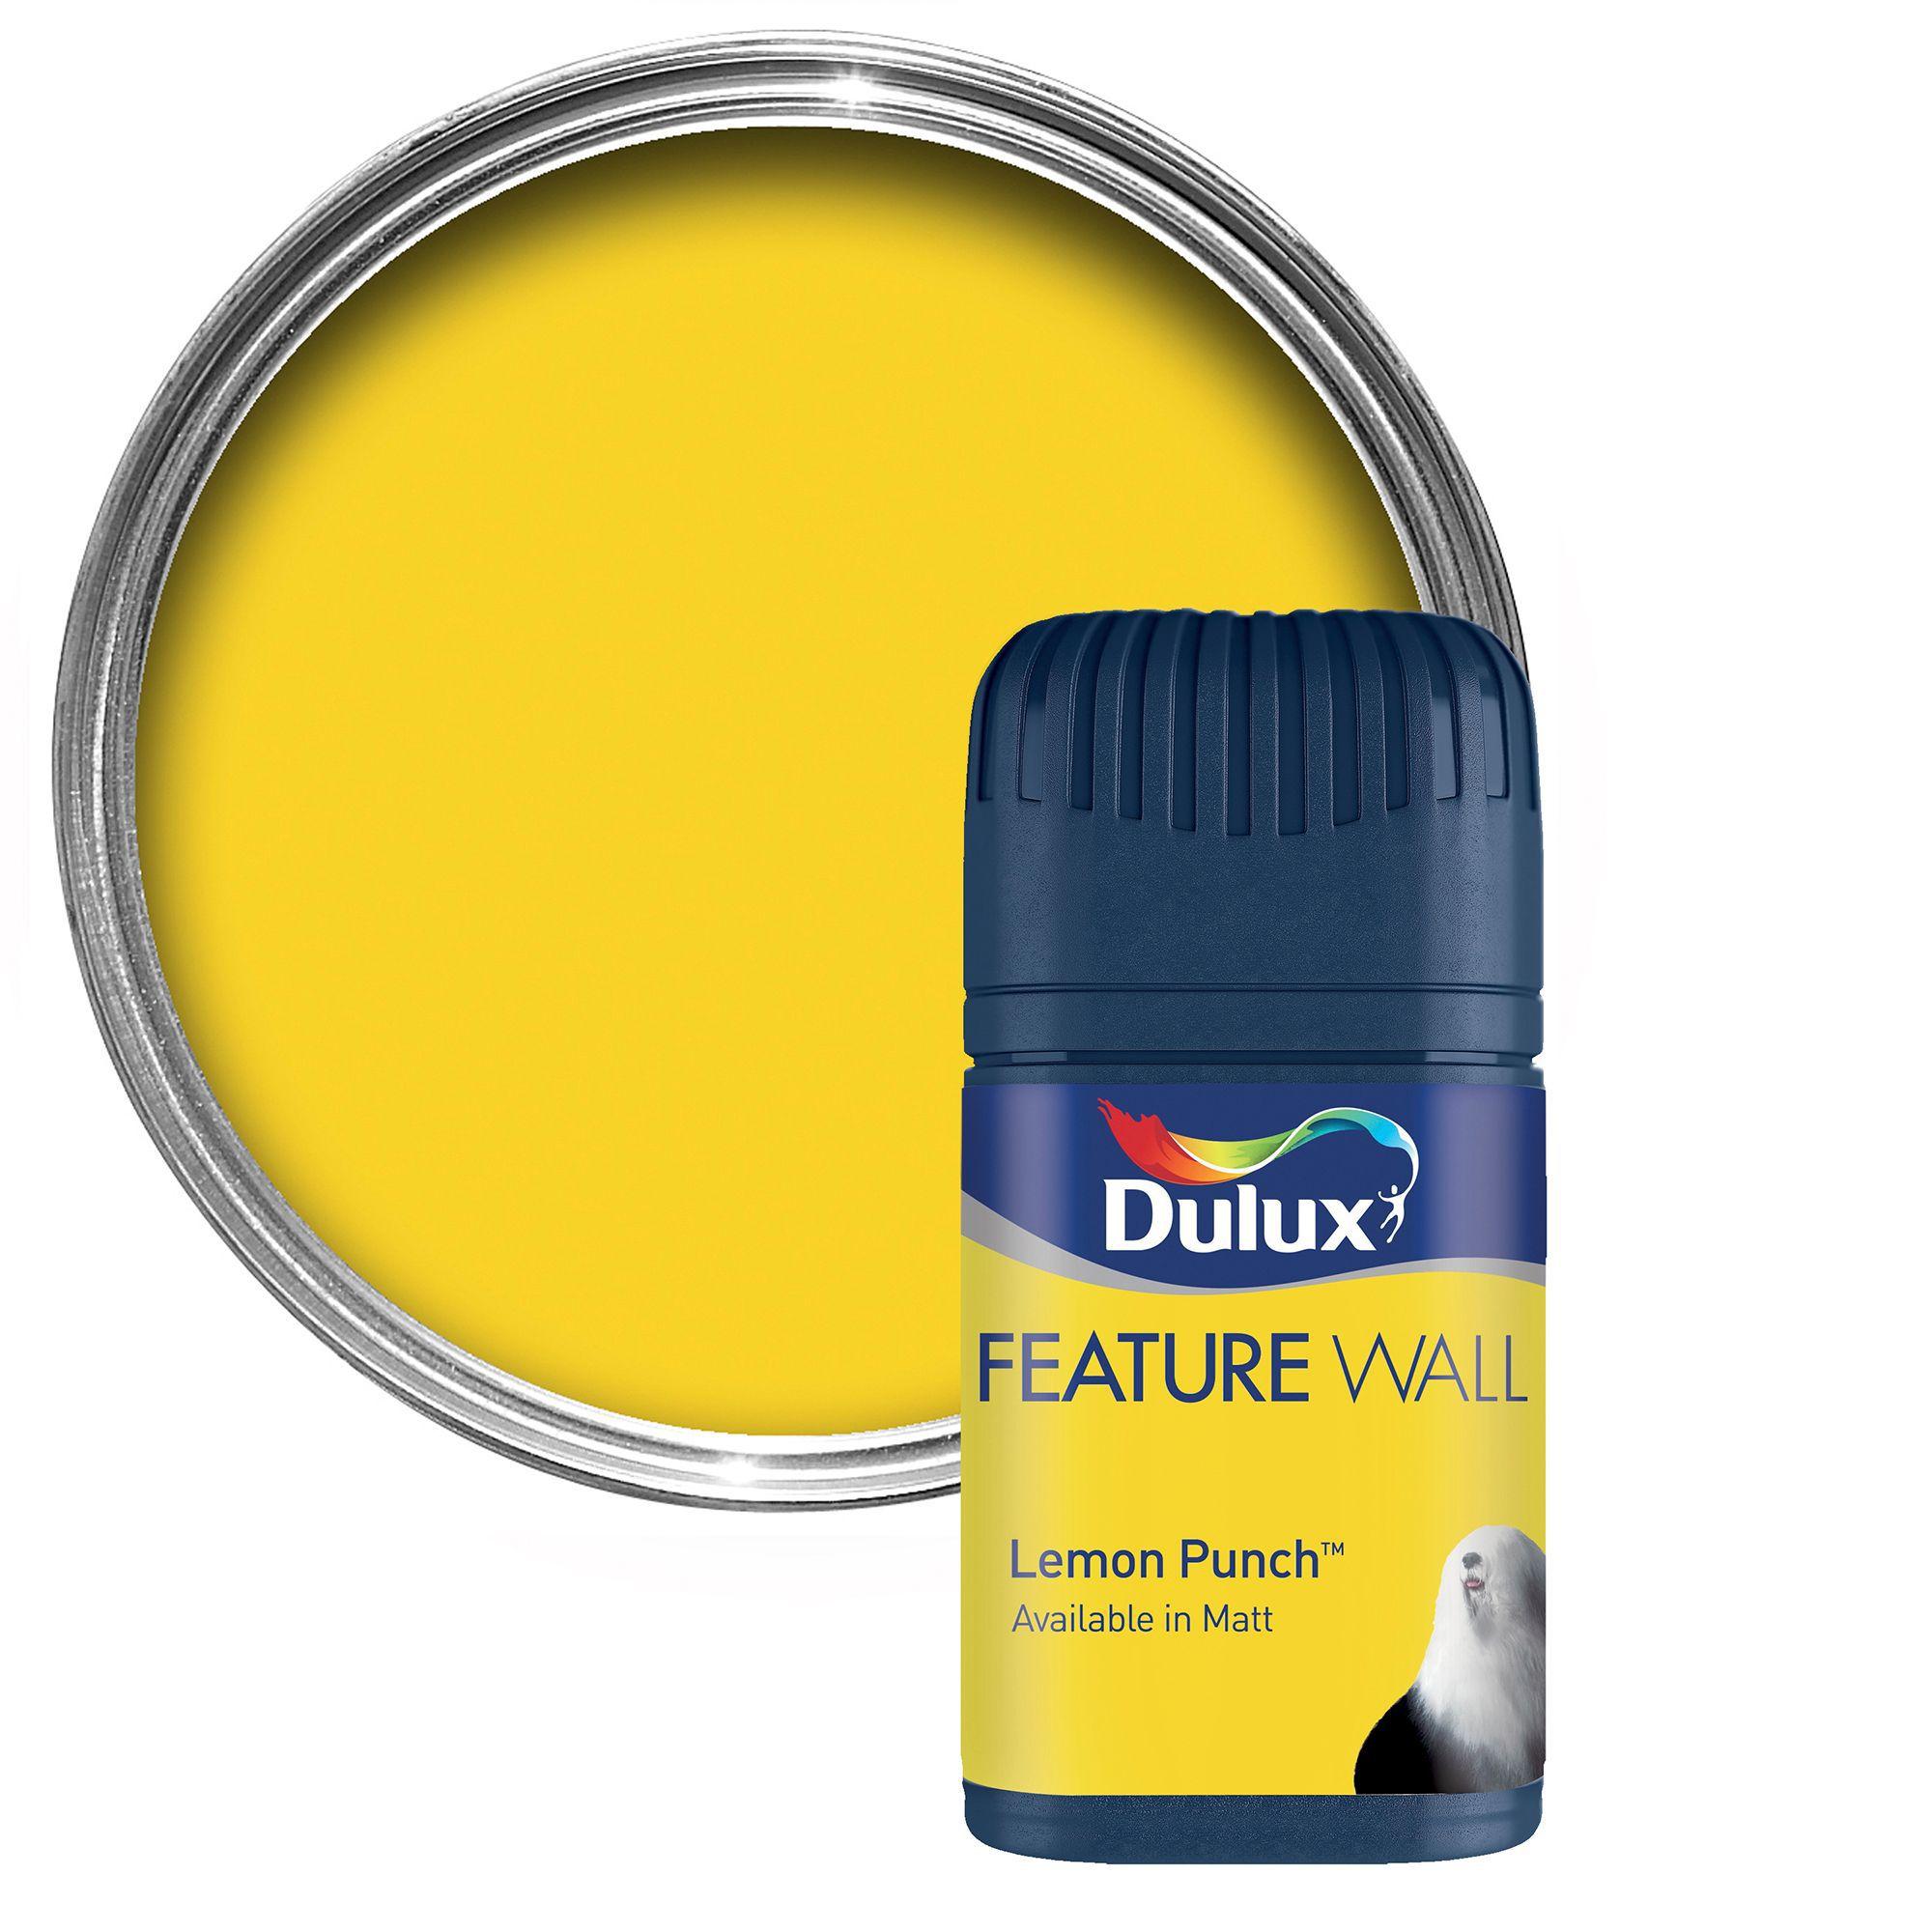 Dulux Feature Wall Lemon Punch Matt Emulsion Paint 0.05l Tester Pot